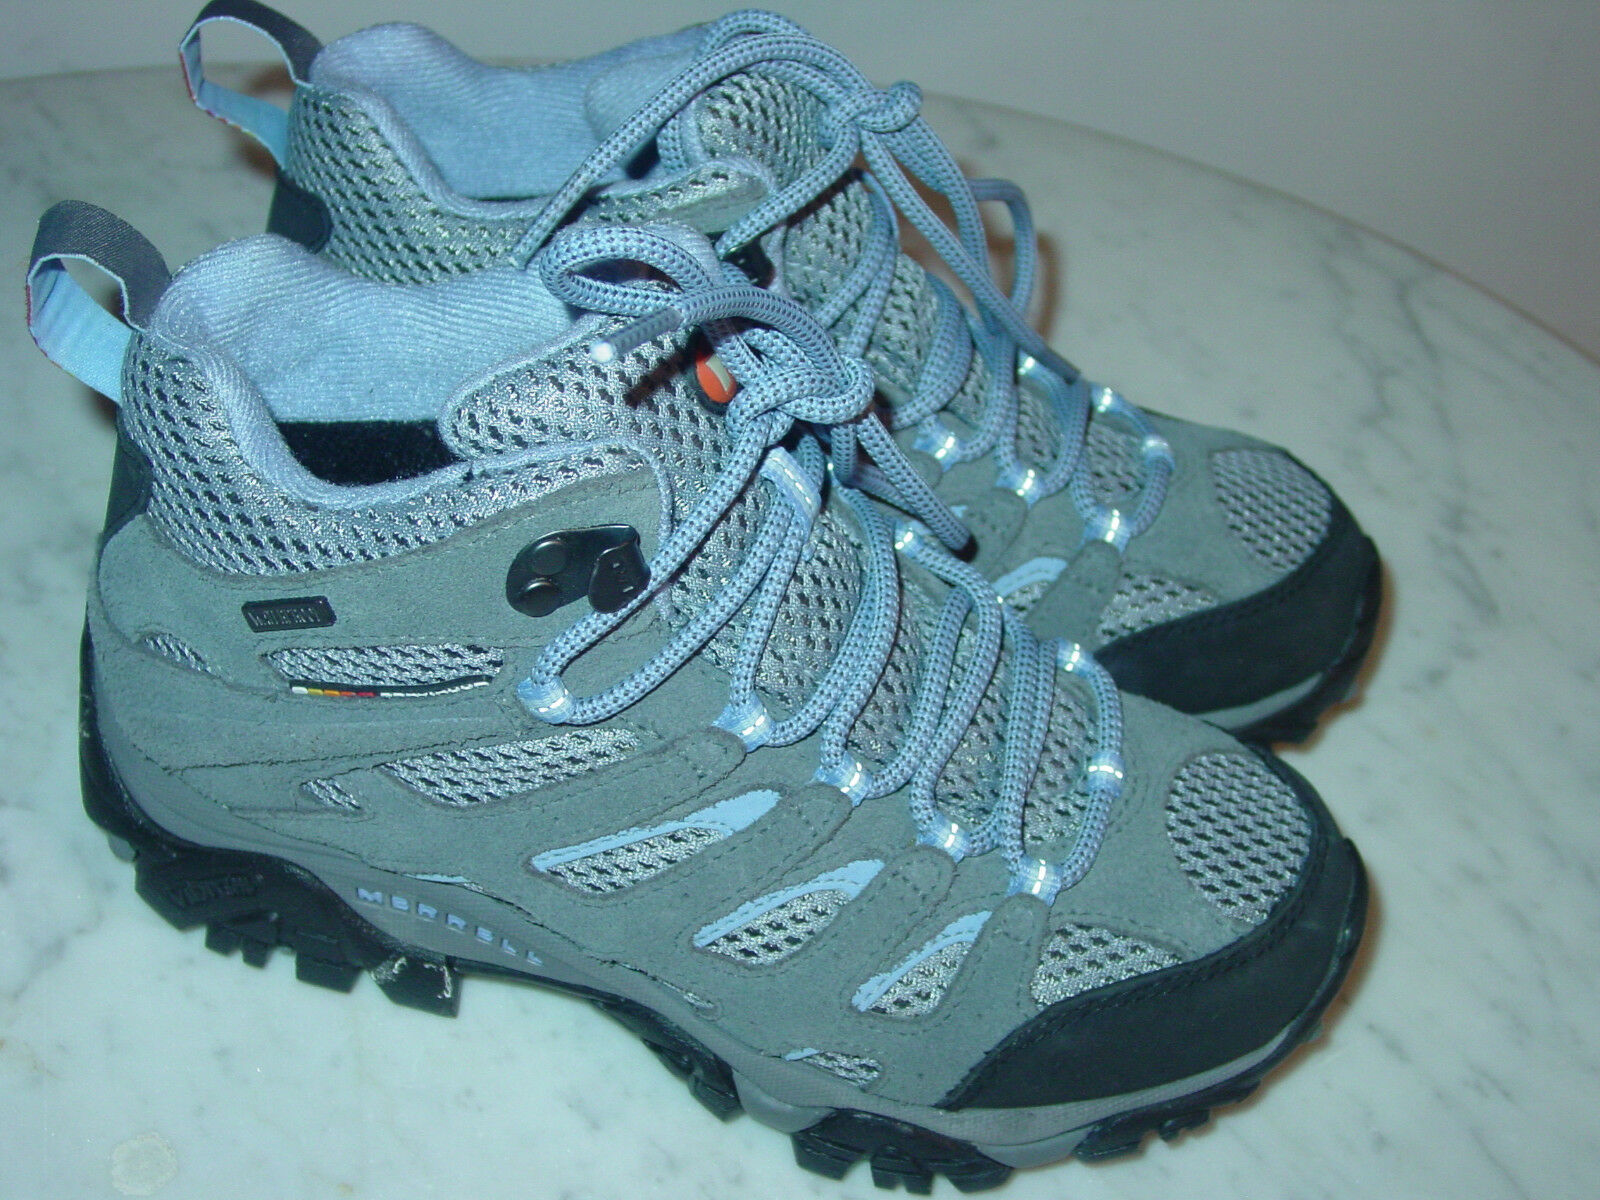 damen Merrell Moab Moab 2 J88792 J88792 J88792 Periwinkle Mid Trail Hiking schuhe Größe 5.5Y 9024b2